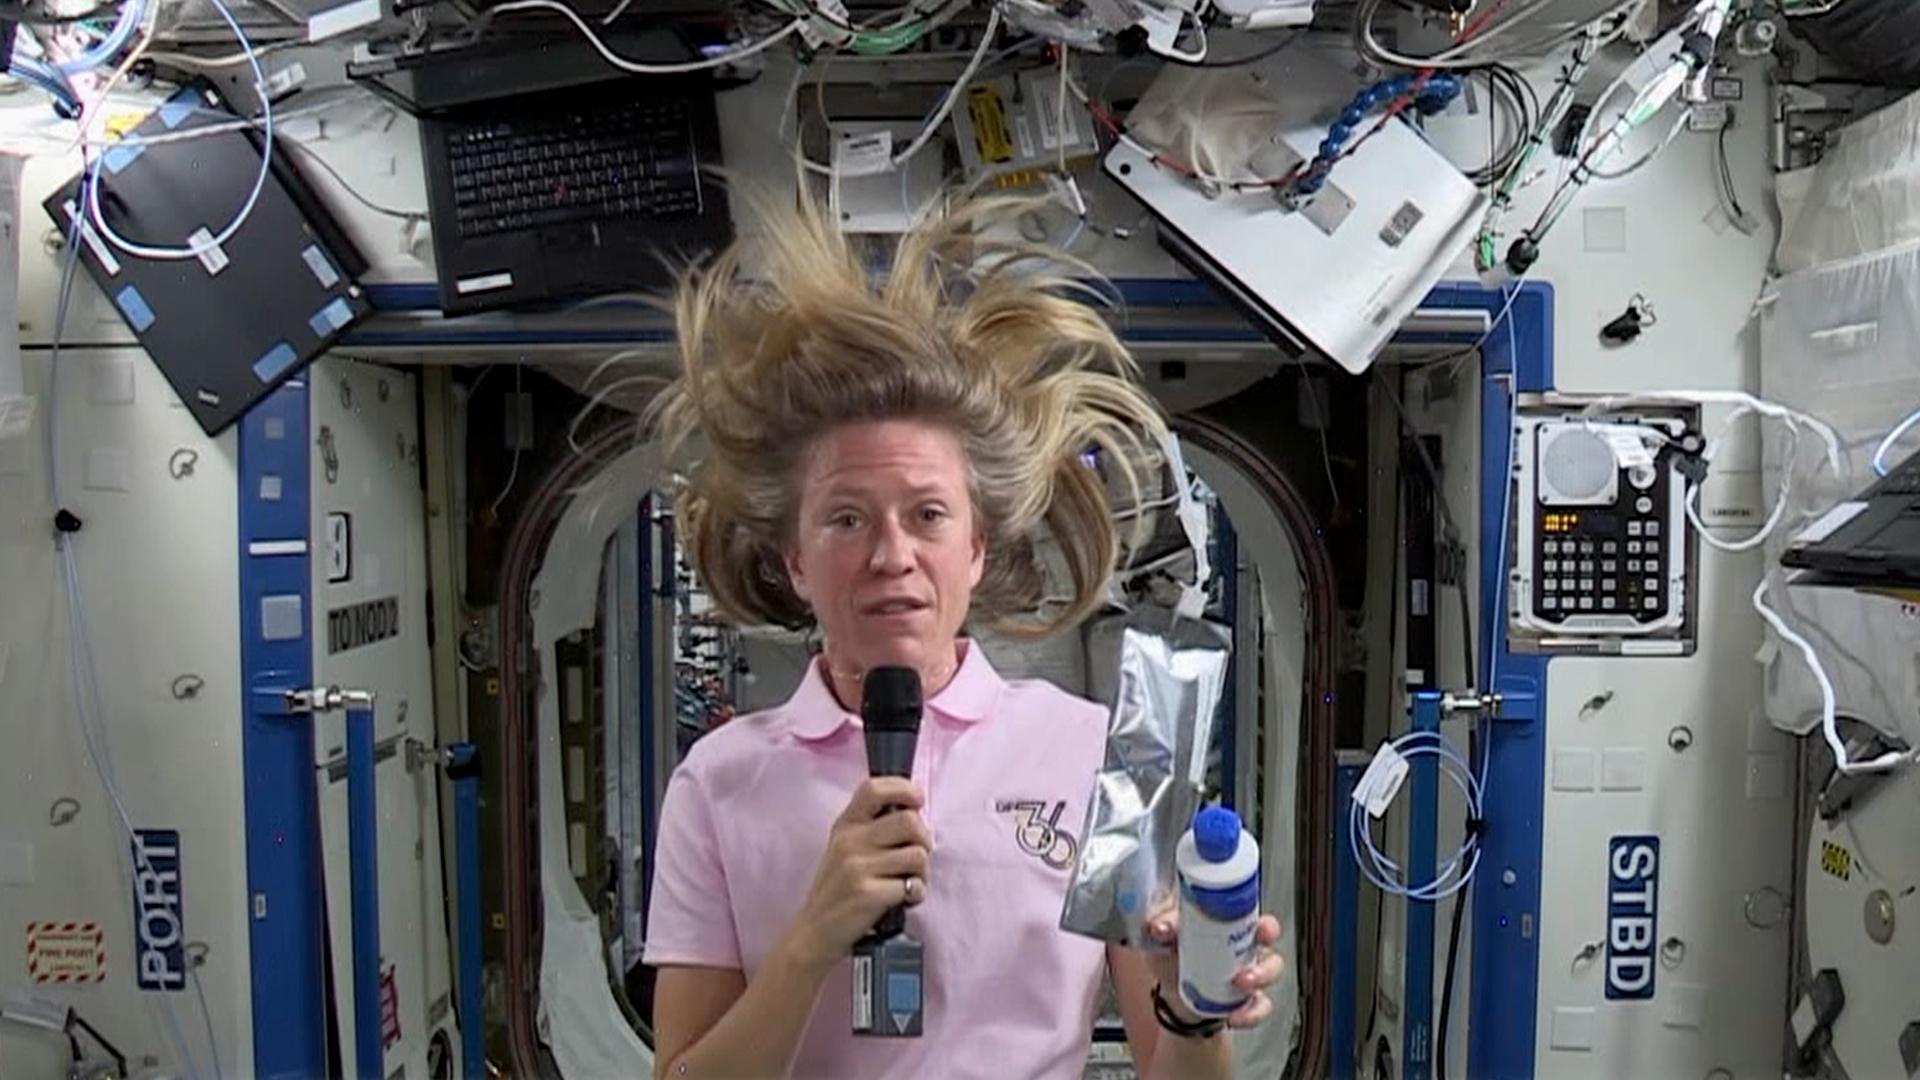 astronaut shampoos hair in space - photo #20